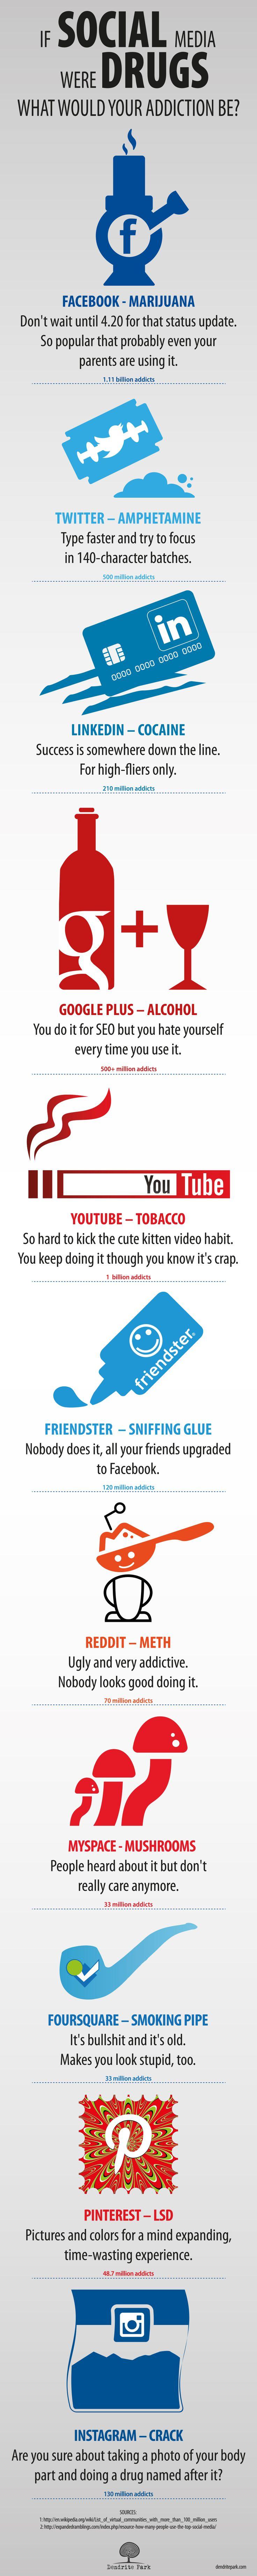 If Social Media were Drugs what would your addiction be! www.facebook.com/kasteelsocialbrandingmarketer  #SocialDrugs #Facebook #Twitter #LinkedIn #Youtube #Pinterest #Google+ #Instagram